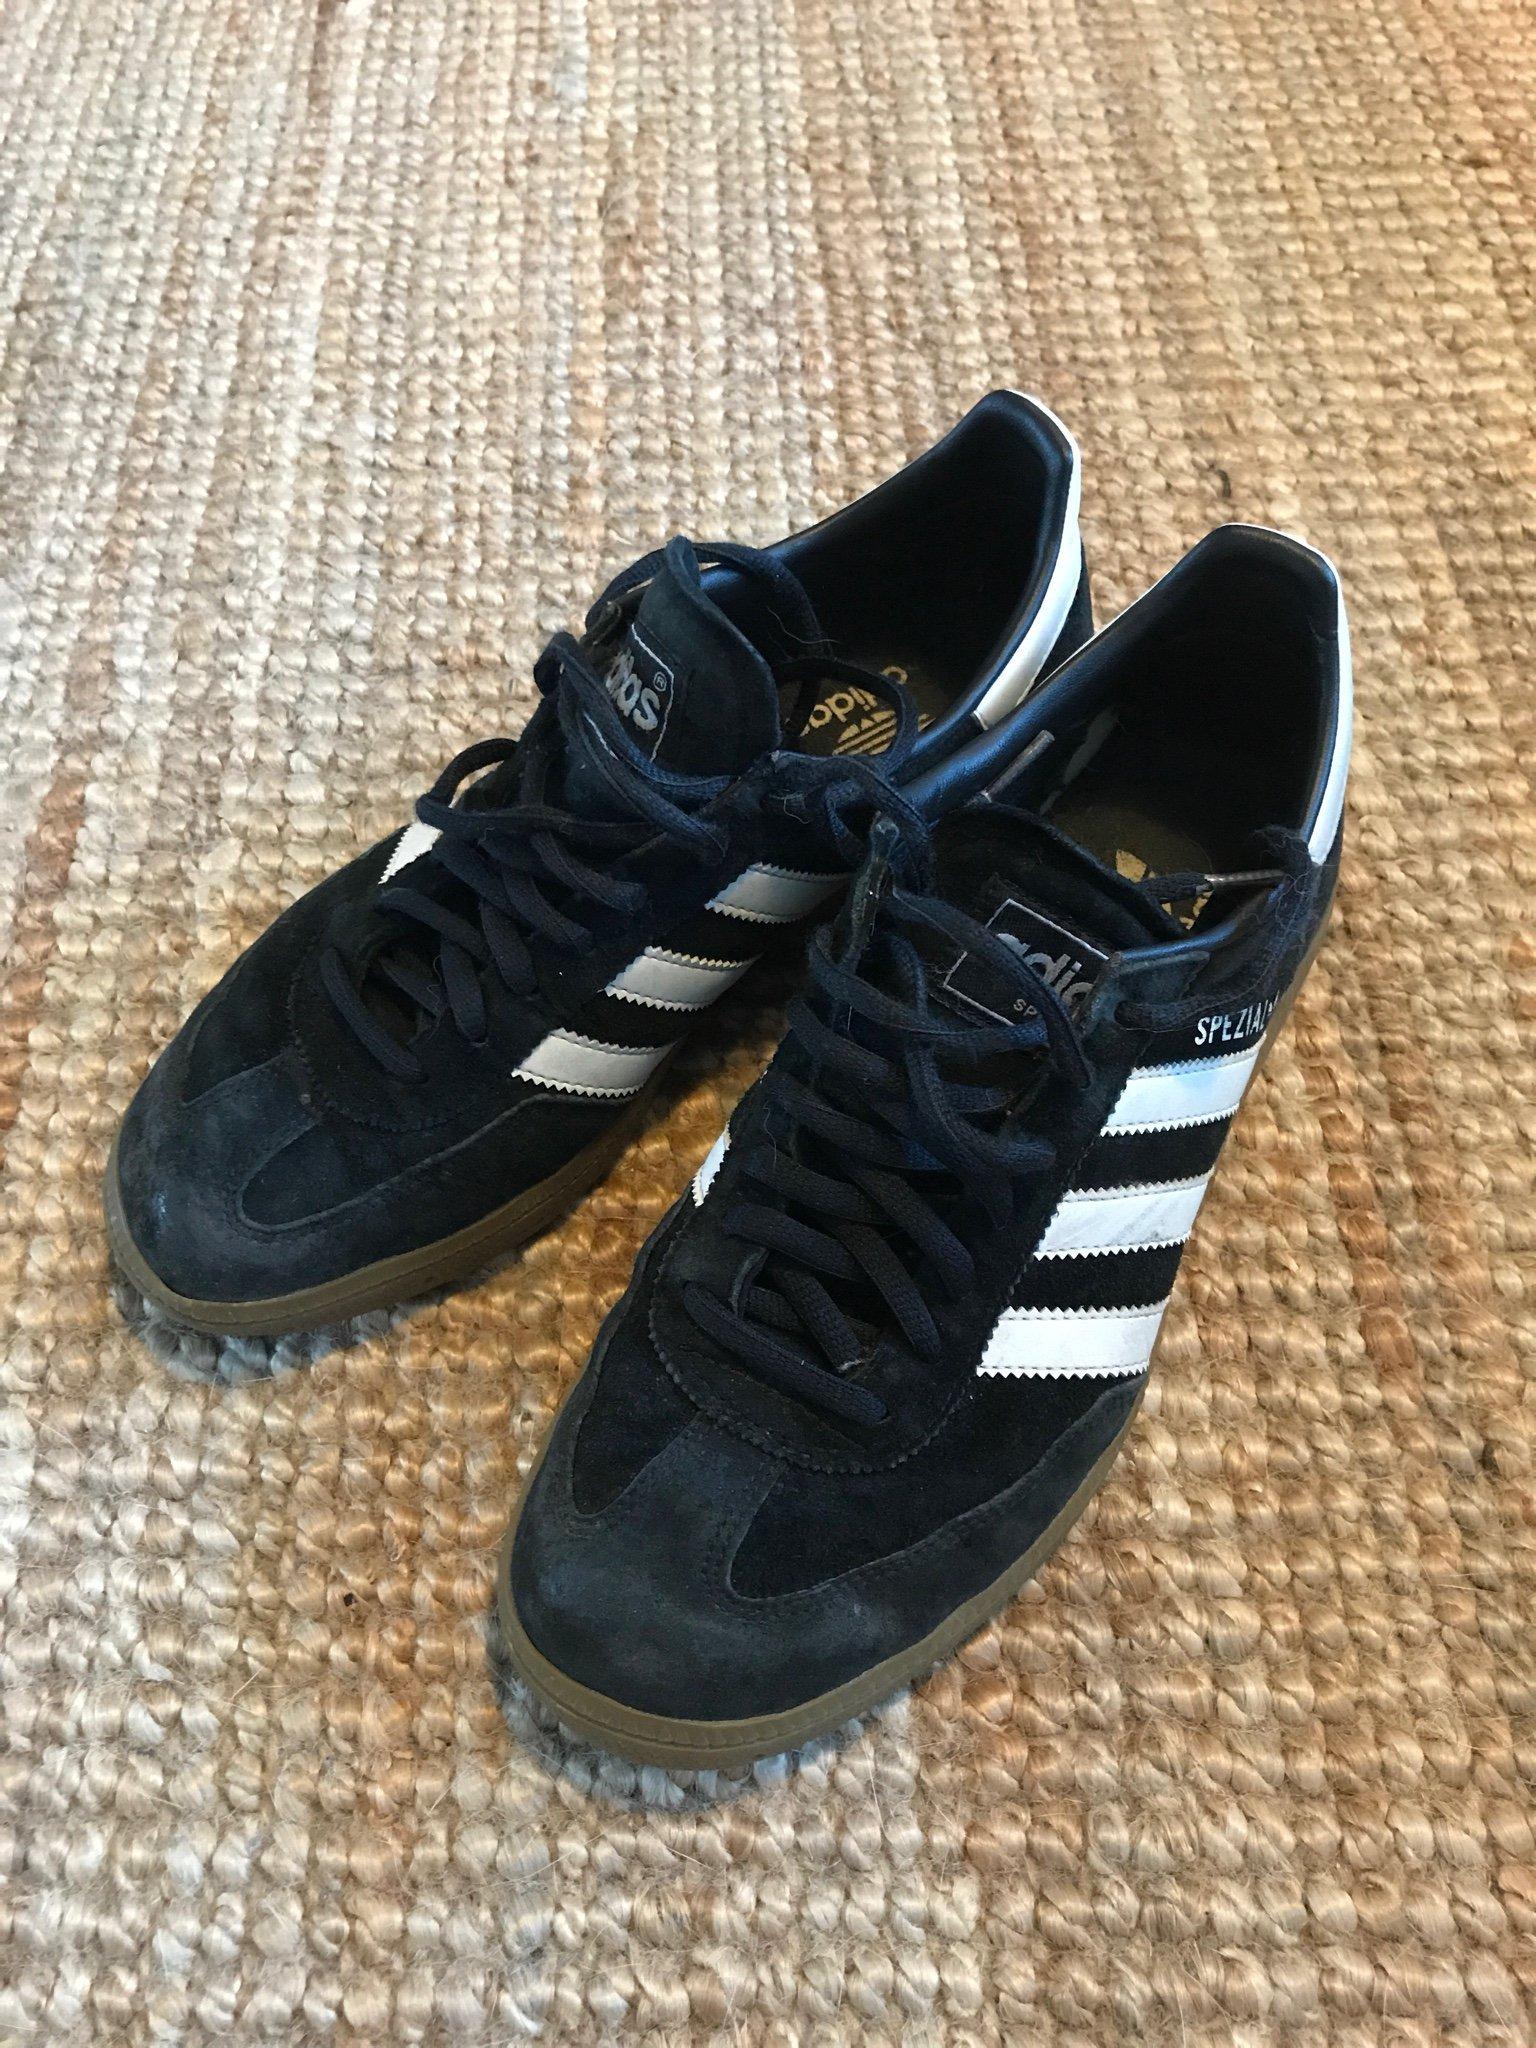 14424b5f311 Adidas Spezial Sneakers Skor Retro Vintage 70-tal (351694504) ᐈ Köp ...